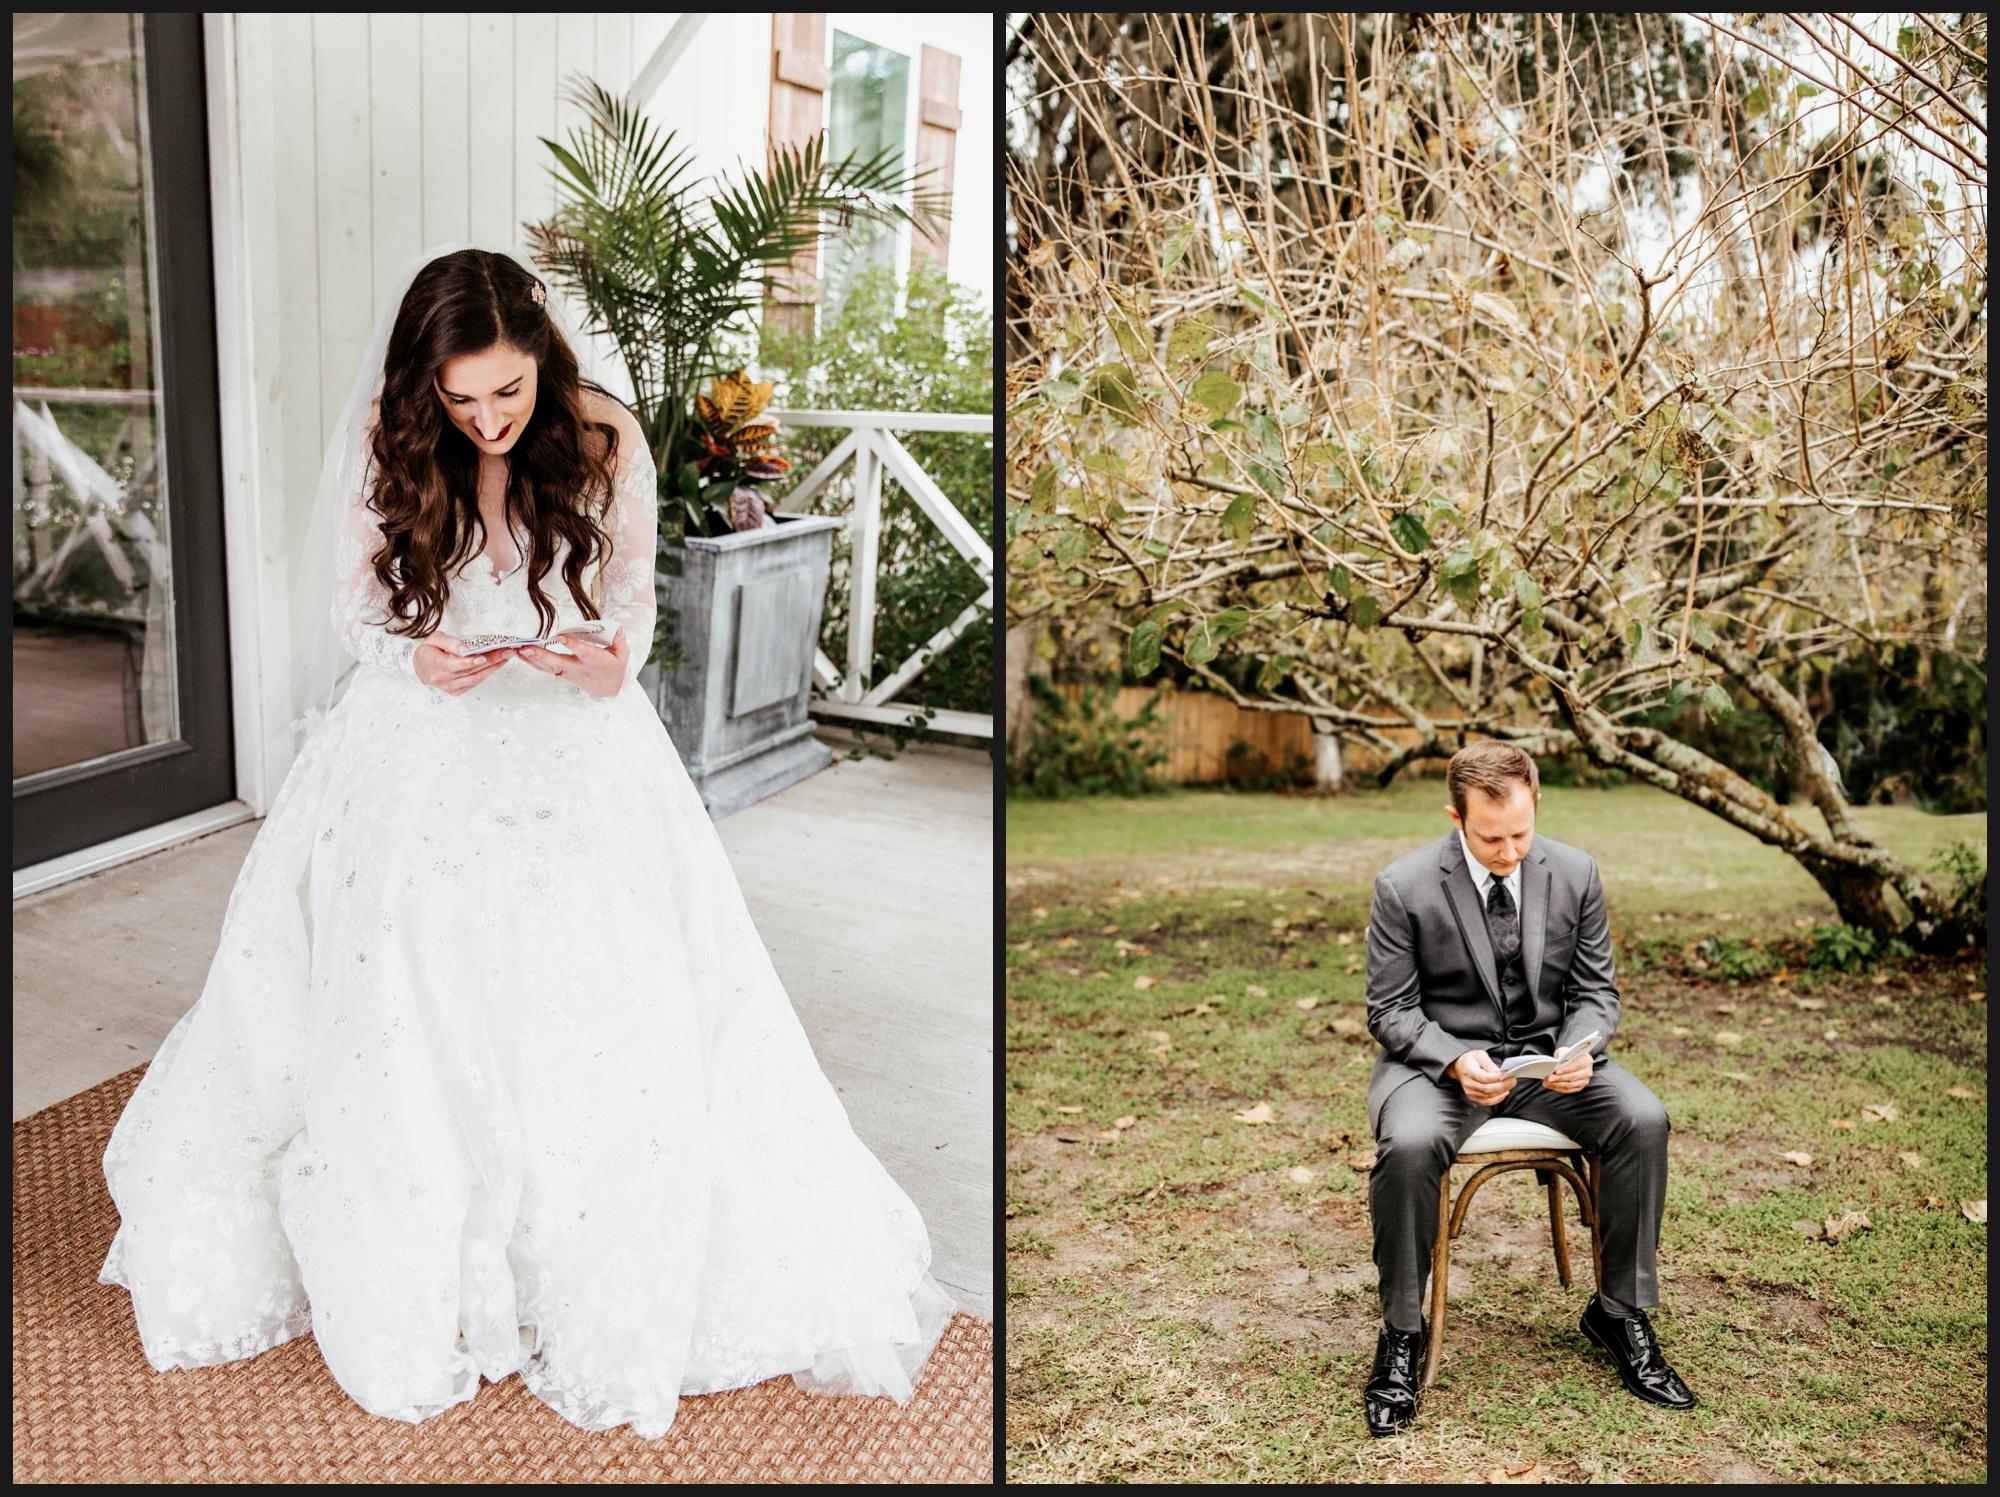 Orlando-Wedding-Photographer-destination-wedding-photographer-florida-wedding-photographer-hawaii-wedding-photographer_0472.jpg